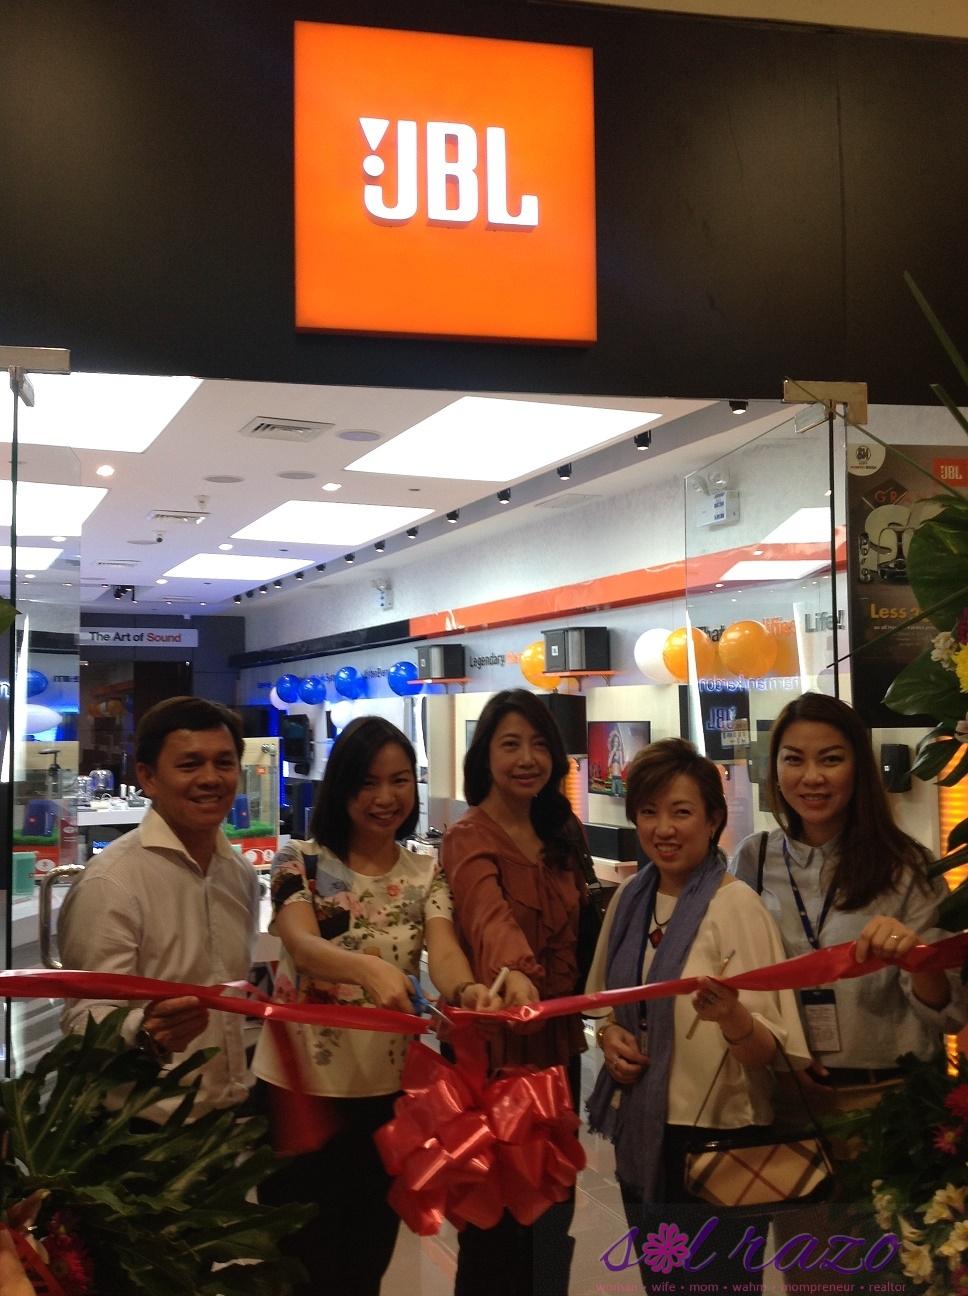 JBL Digital Dreams Store